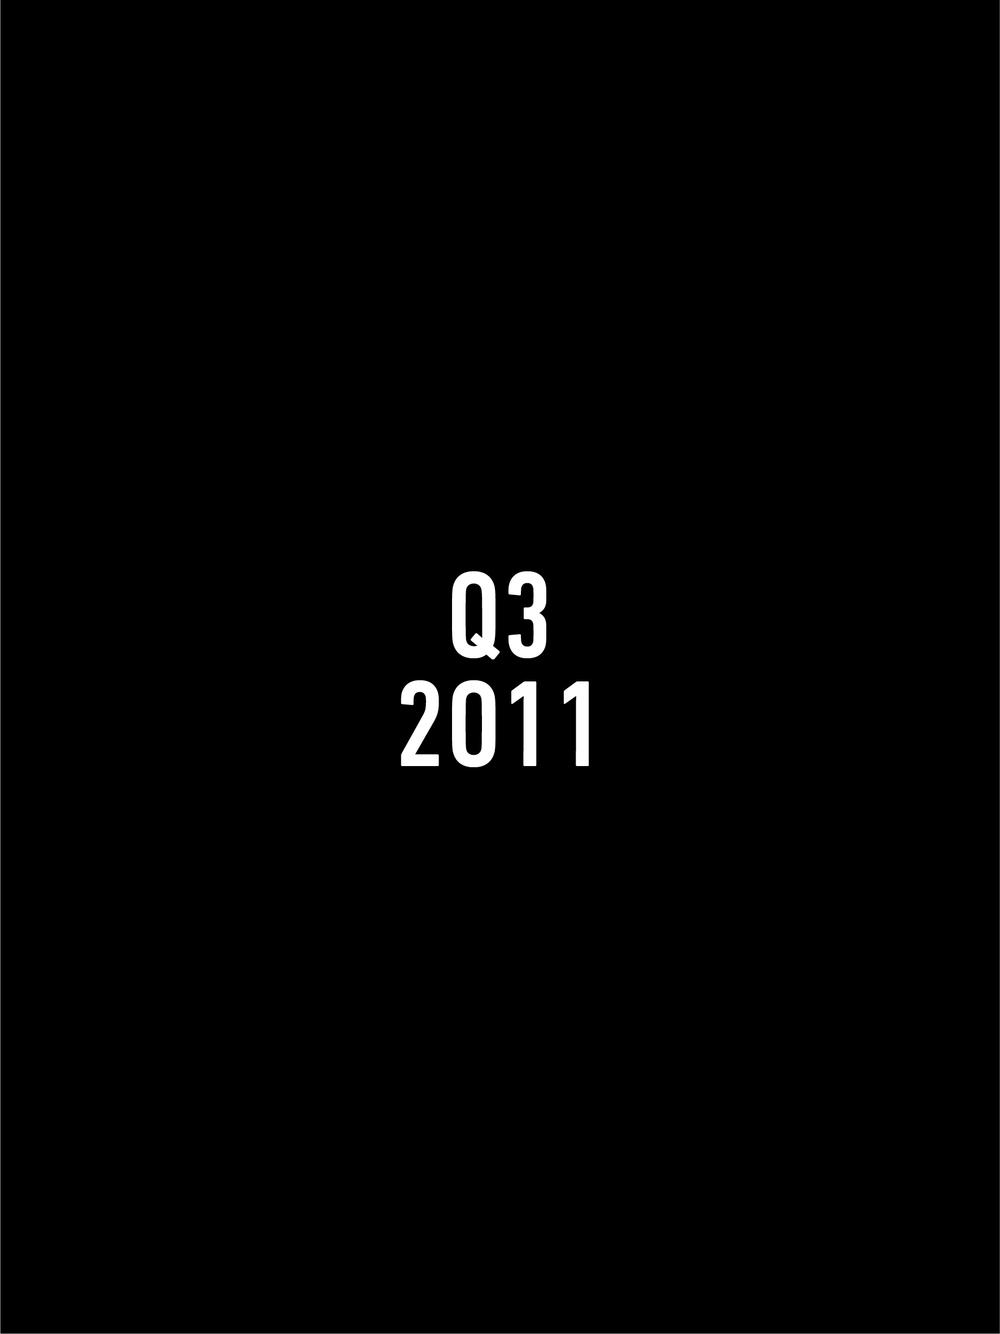 Quarterley 20123.jpg